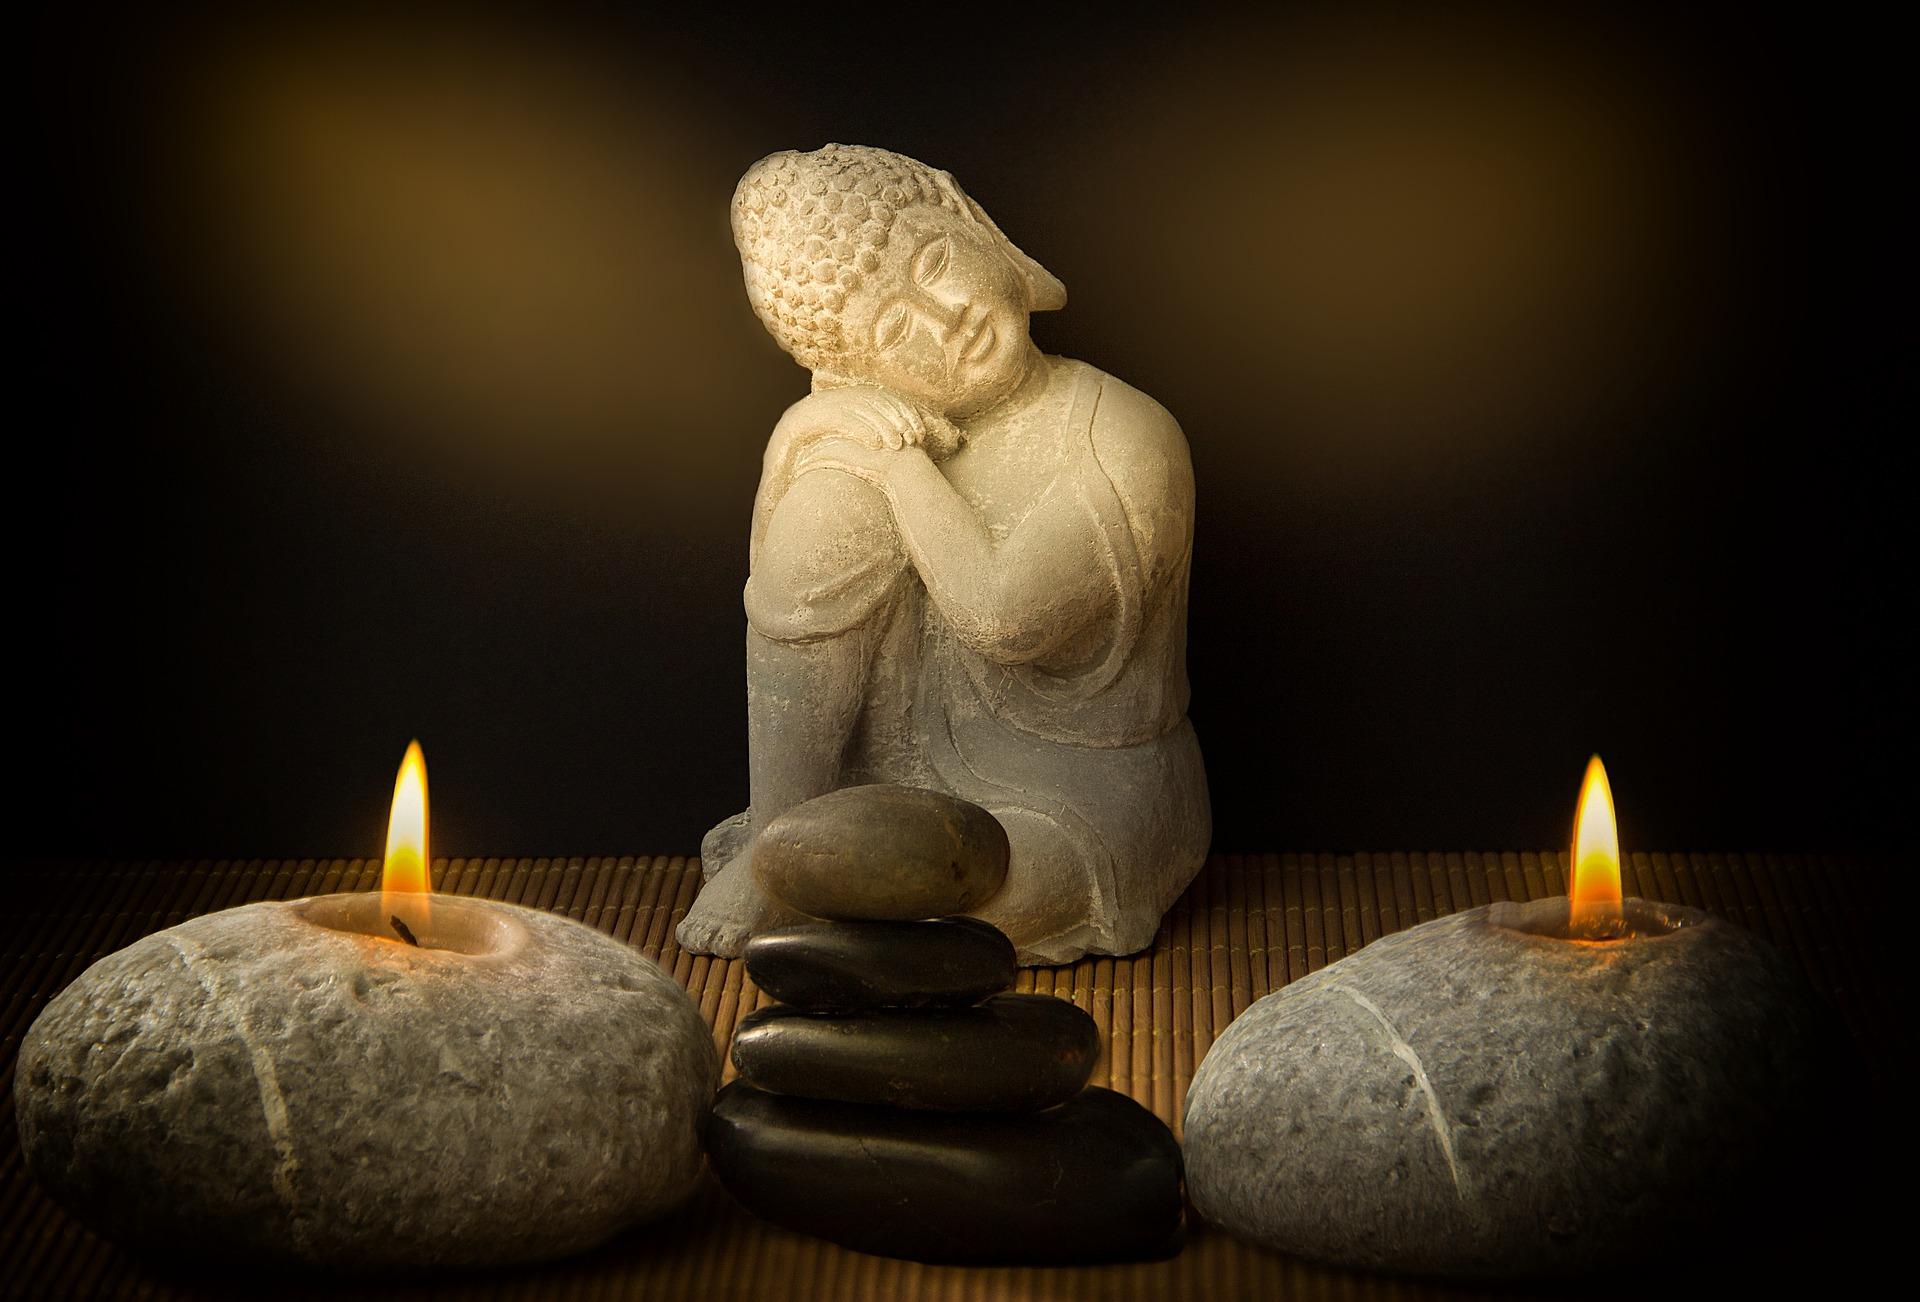 buddha et bougie